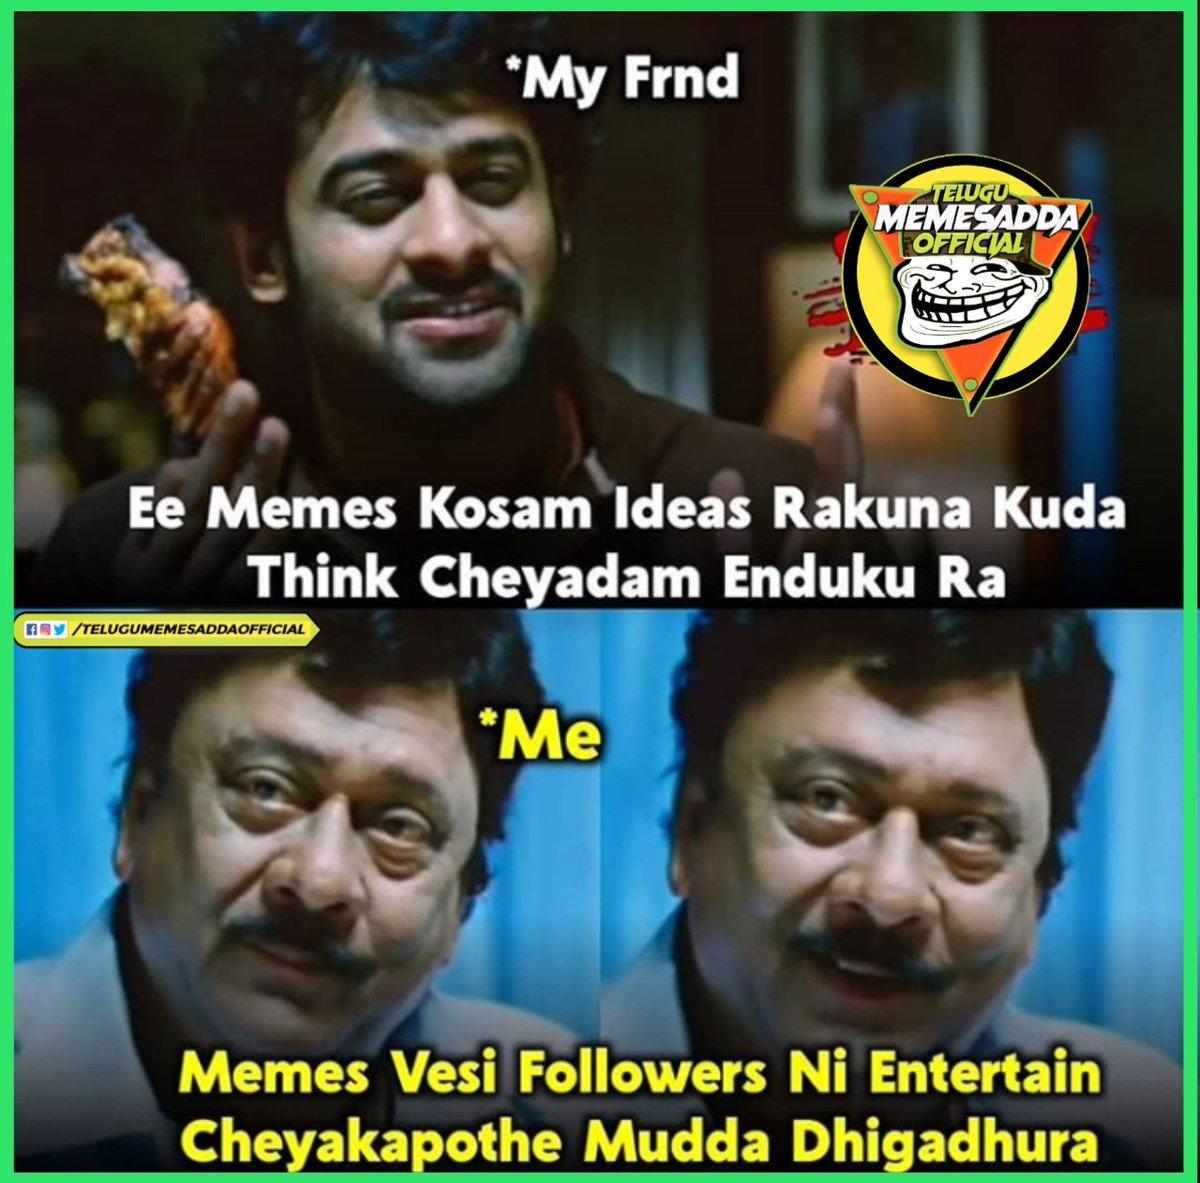 FOLLOW & SHARE  *TeluguMemesAddaOfficial.*  For More Entertainment And Updates  #vijaydevarakonda,#Maheshbabu,#Pawankalyan,#unprofessionaltrollers,#telugudubsmash,#rashmikamadanna,#Anupamaparameswaran,#Prabhas,#Alluarjun,#nani,#kajalagarwal,#keerthisuresh,#poojahedgepic.twitter.com/vpohiPUTSQ